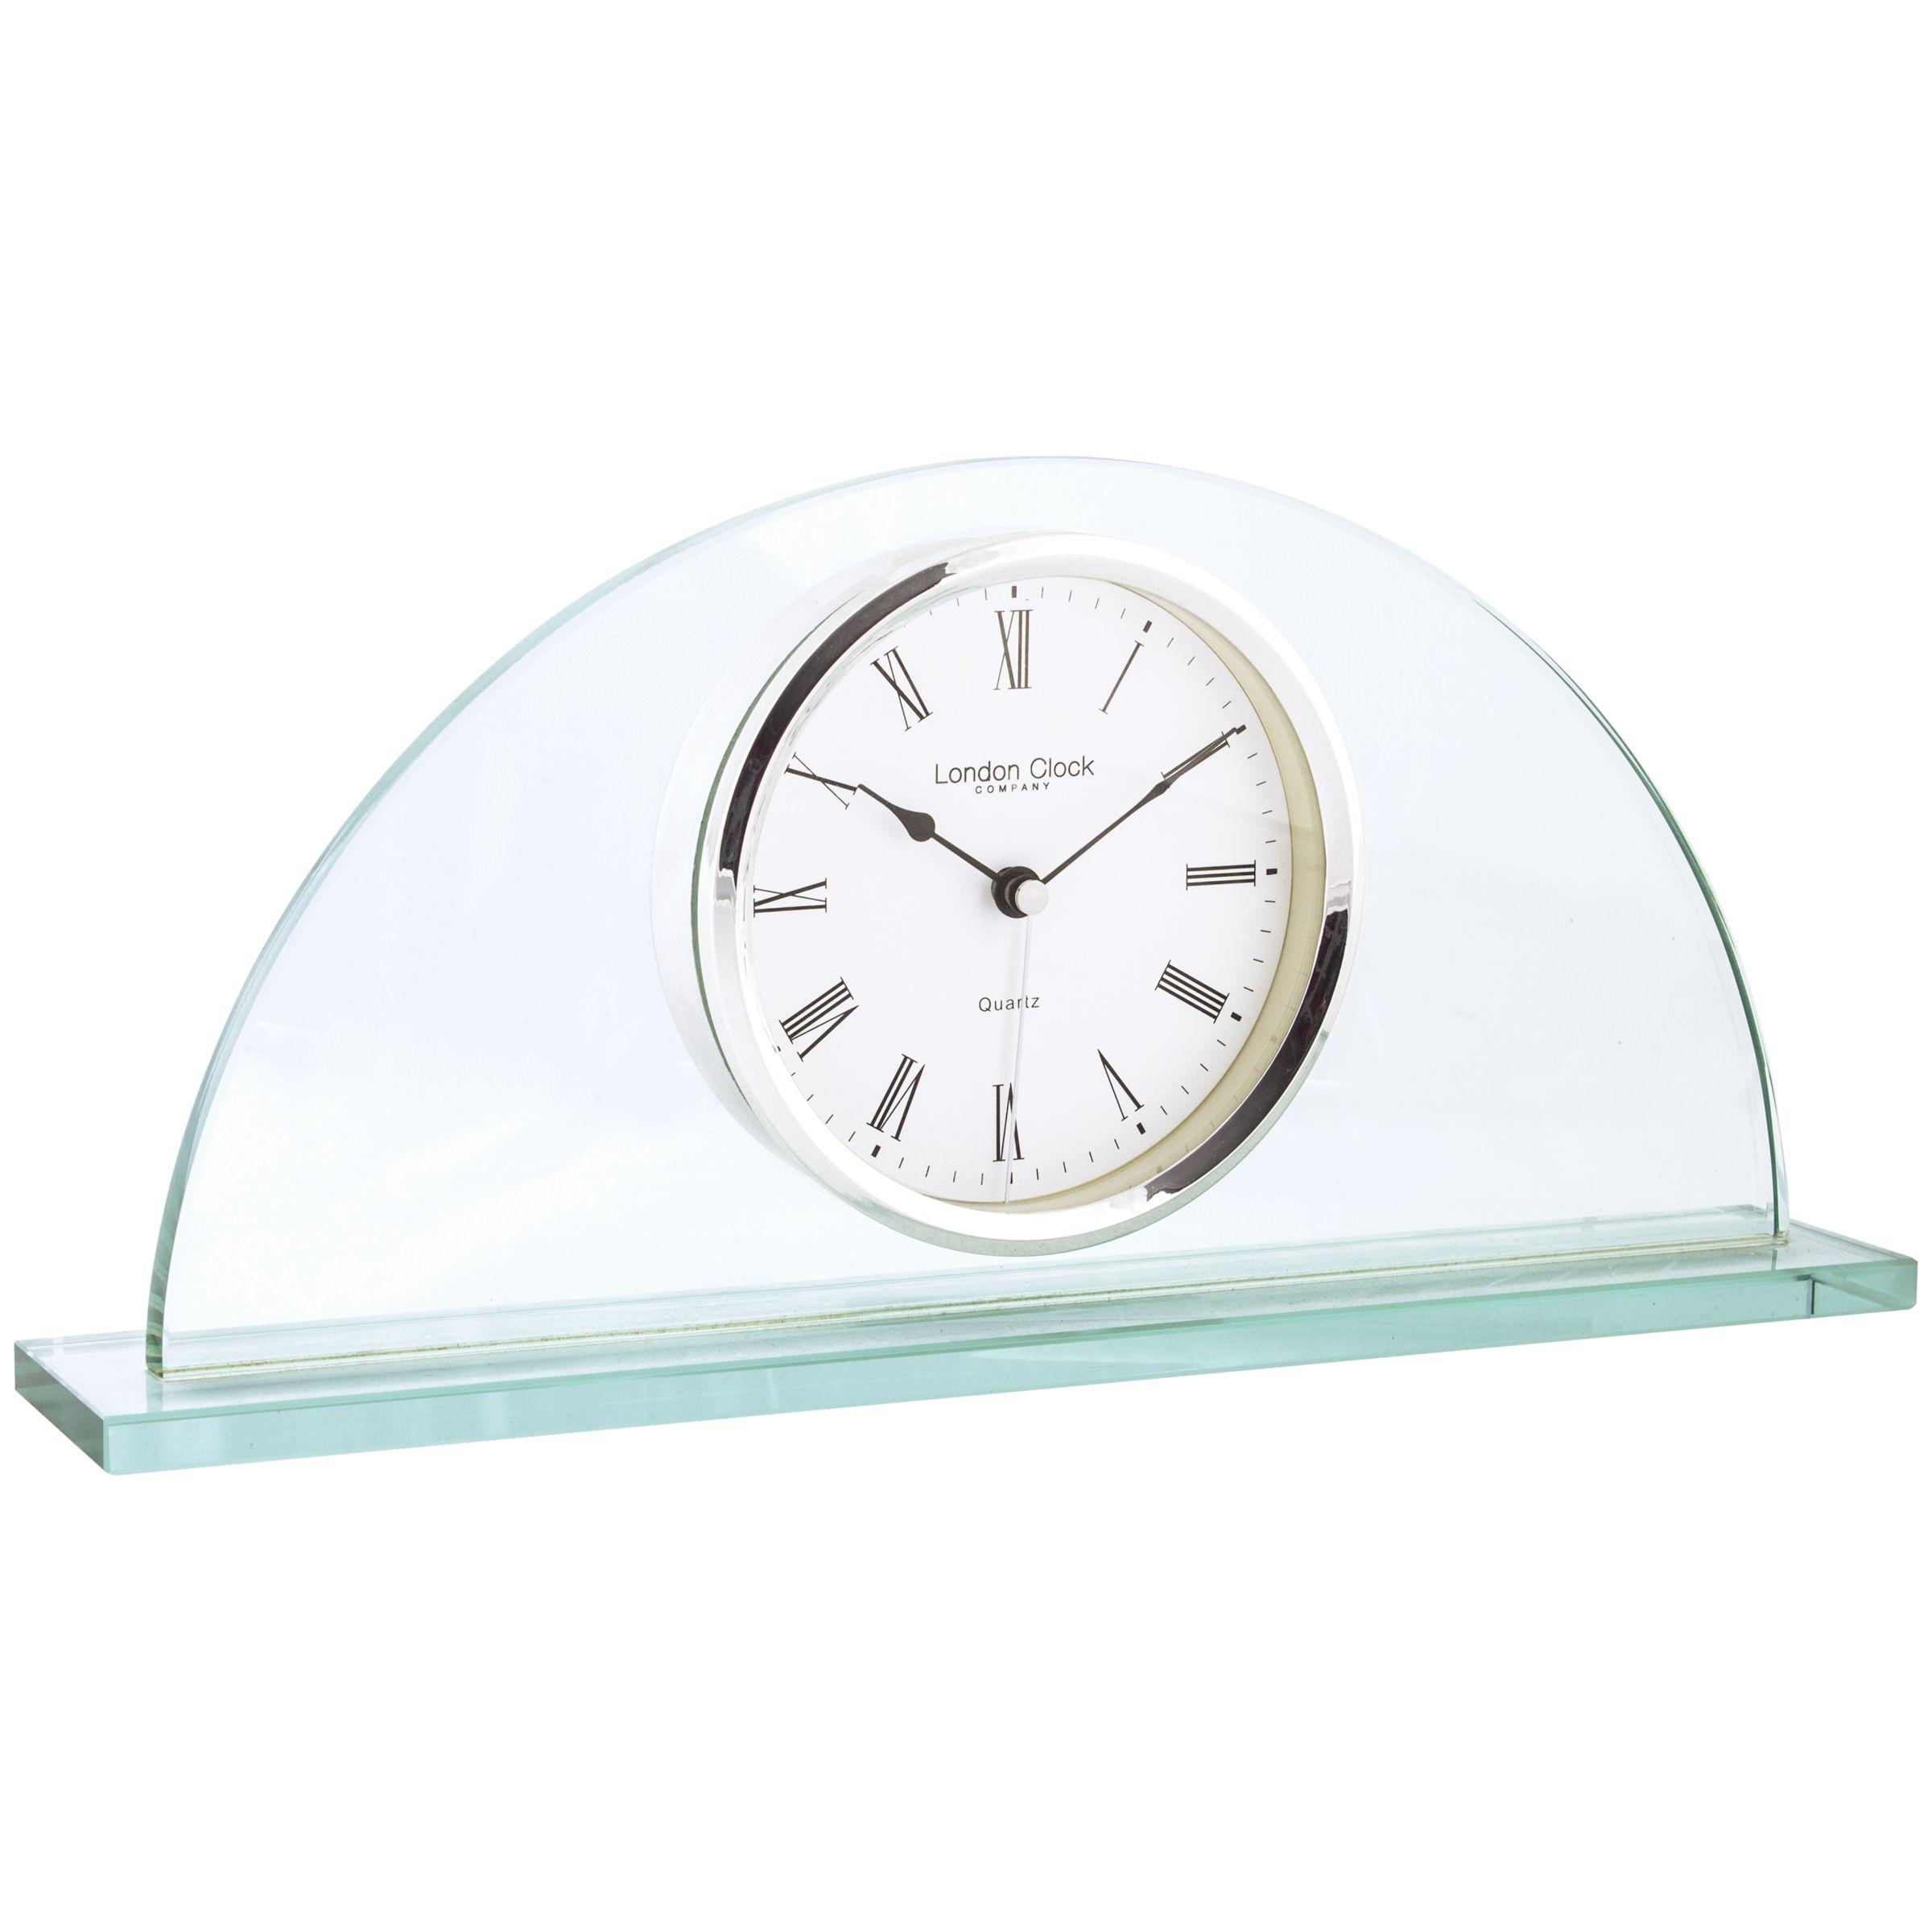 London Clock Company London Clock Company Half Moon Mantel Clock, Glass